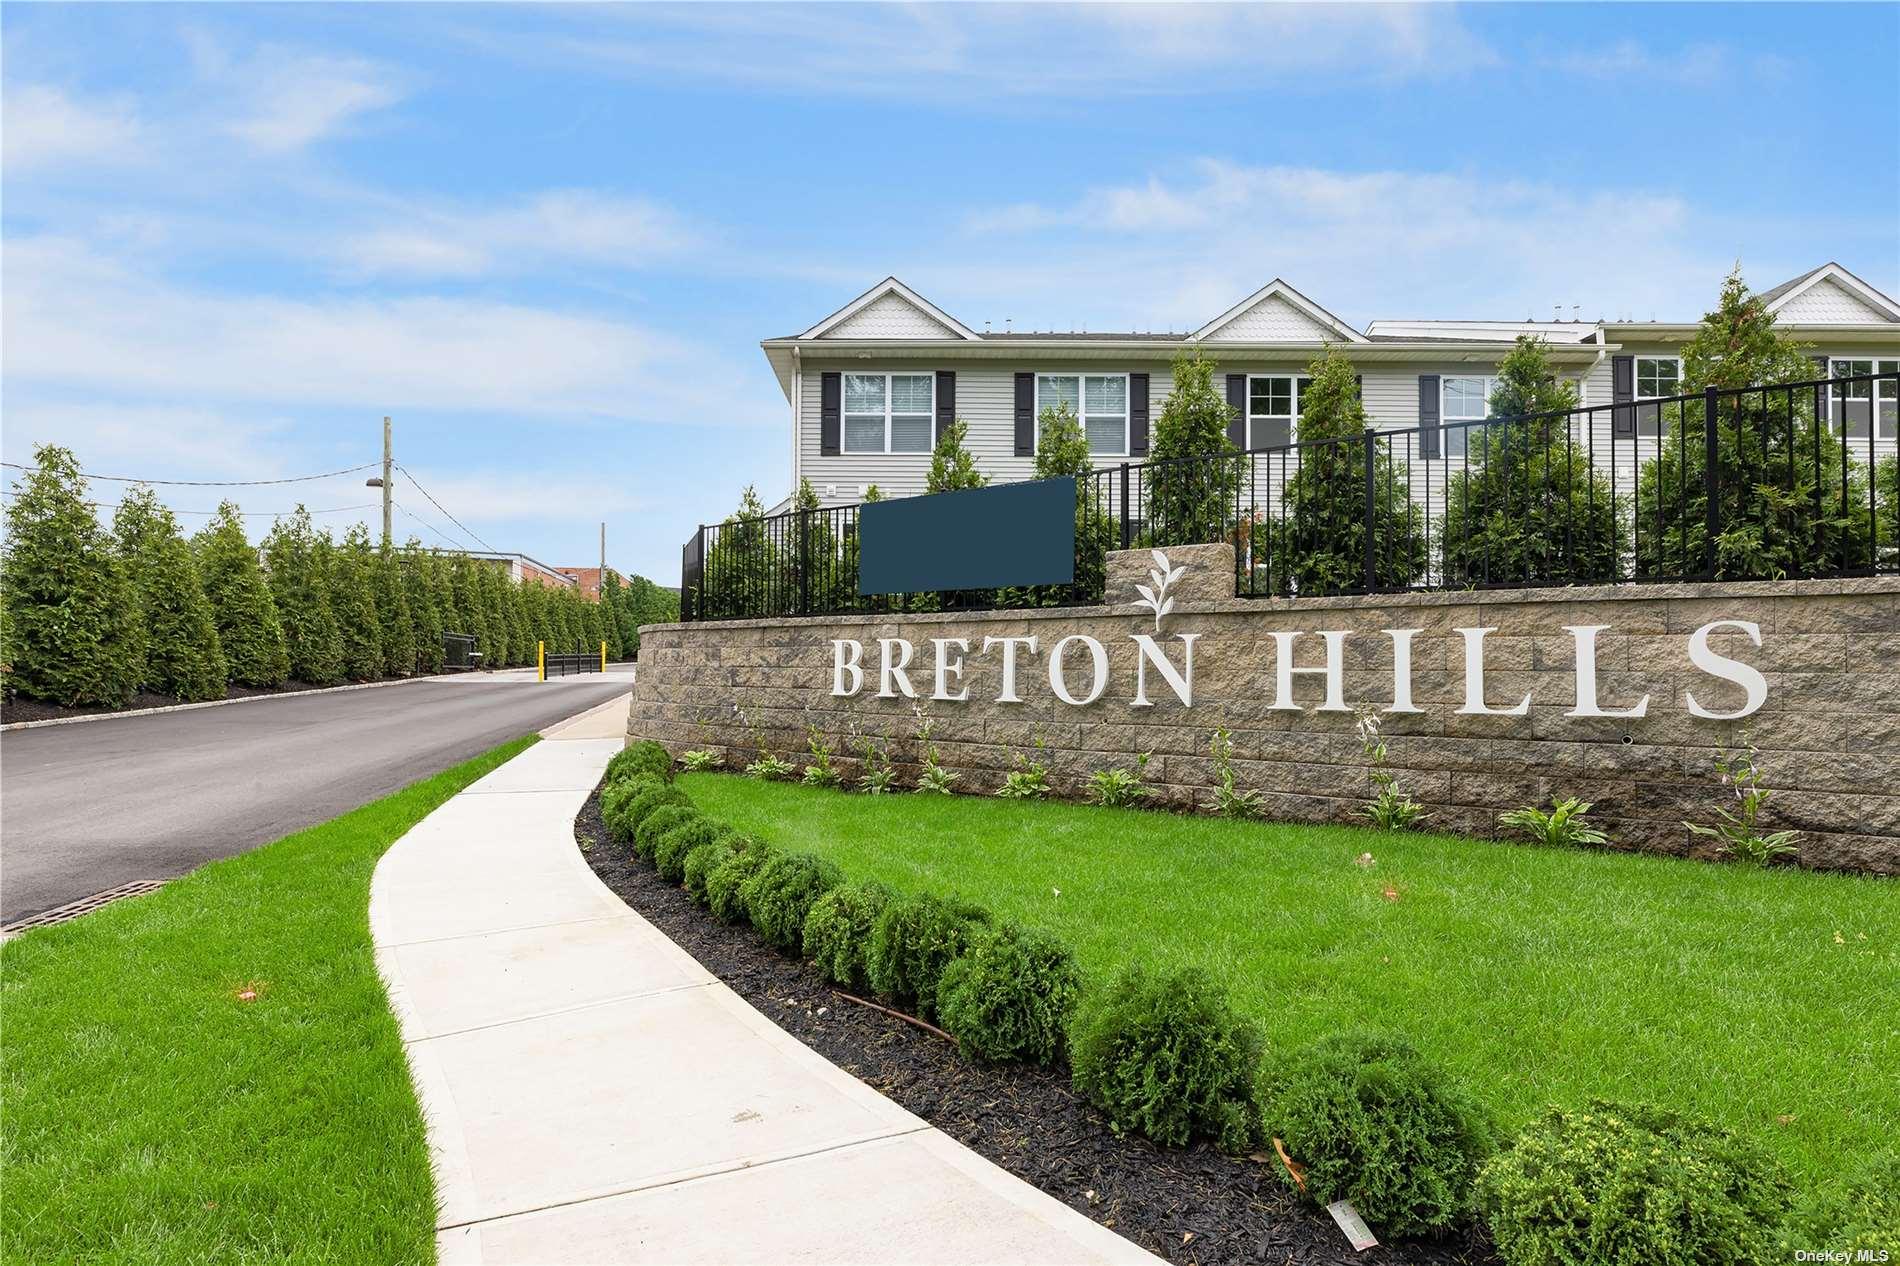 504 Breton Way Upper, Glen Cove, NY 11542